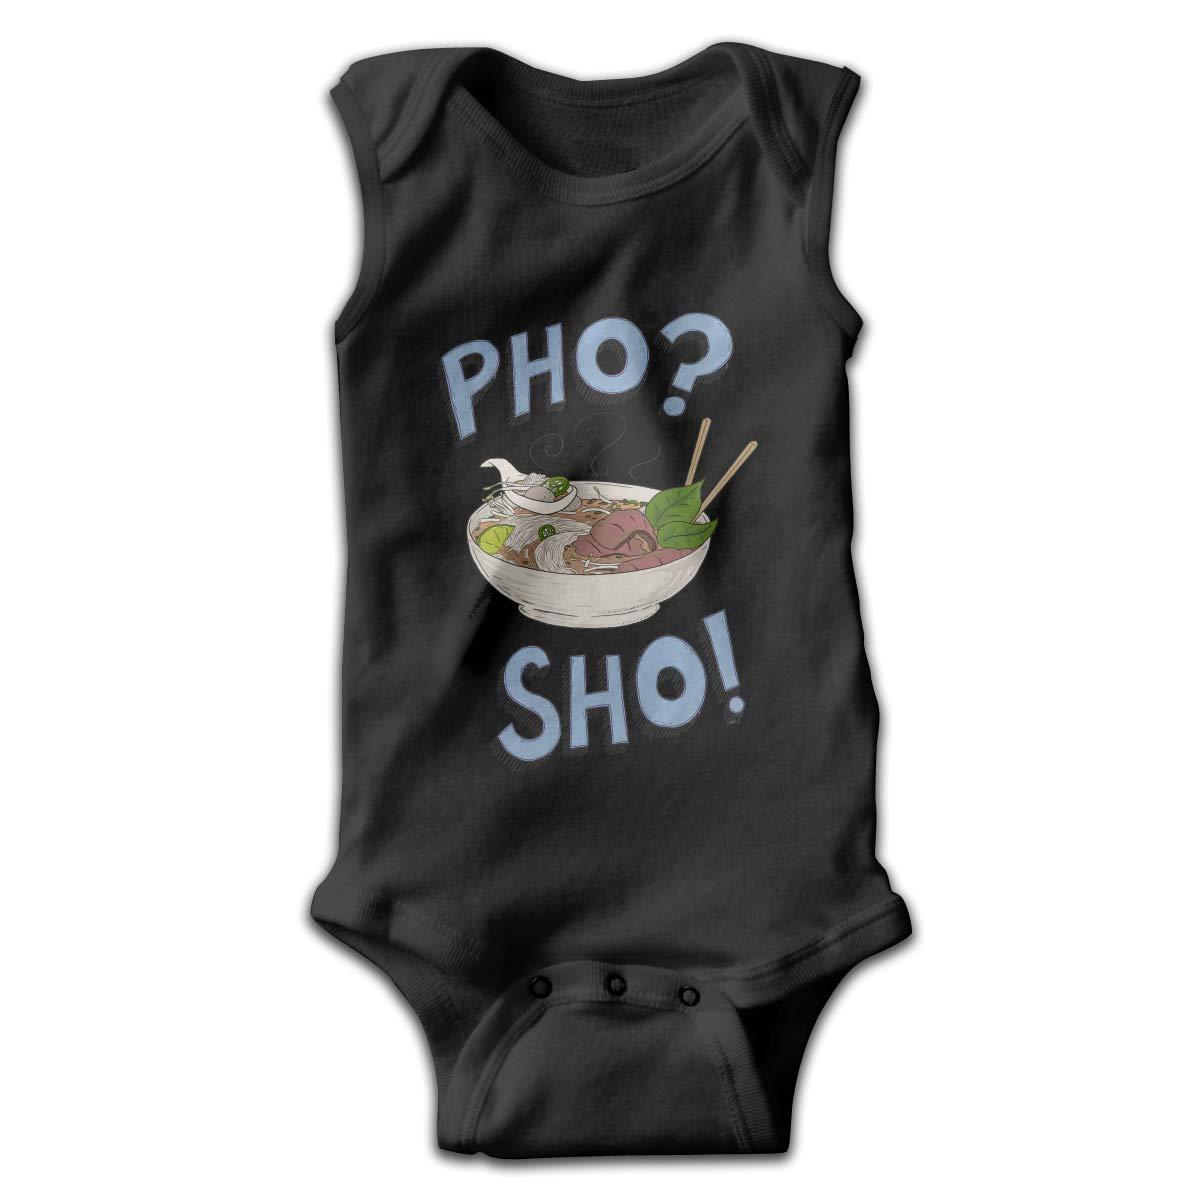 Efbj Newborn Baby Girls Rompers Sleeveless Cotton Onesie,Pho Sho Bodysuit Autumn Pajamas